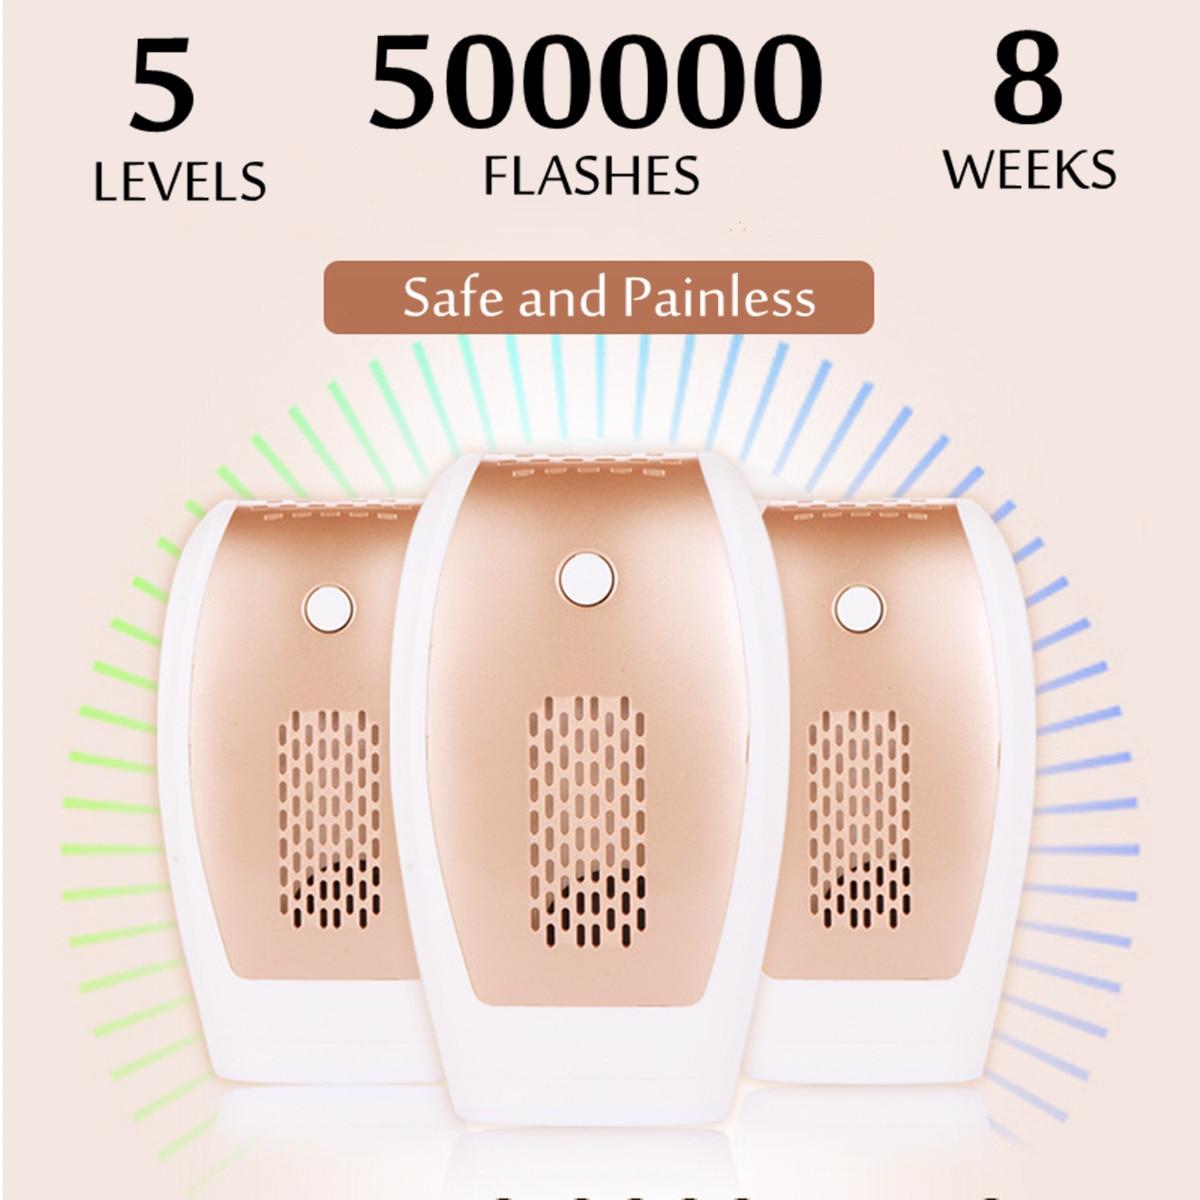 Hair Remover Laser IPL Epillator Lip Armpit Body Bikini Removal 500000 Flashes Painless Five Adjustable US/EU Plug Safe 110~240V